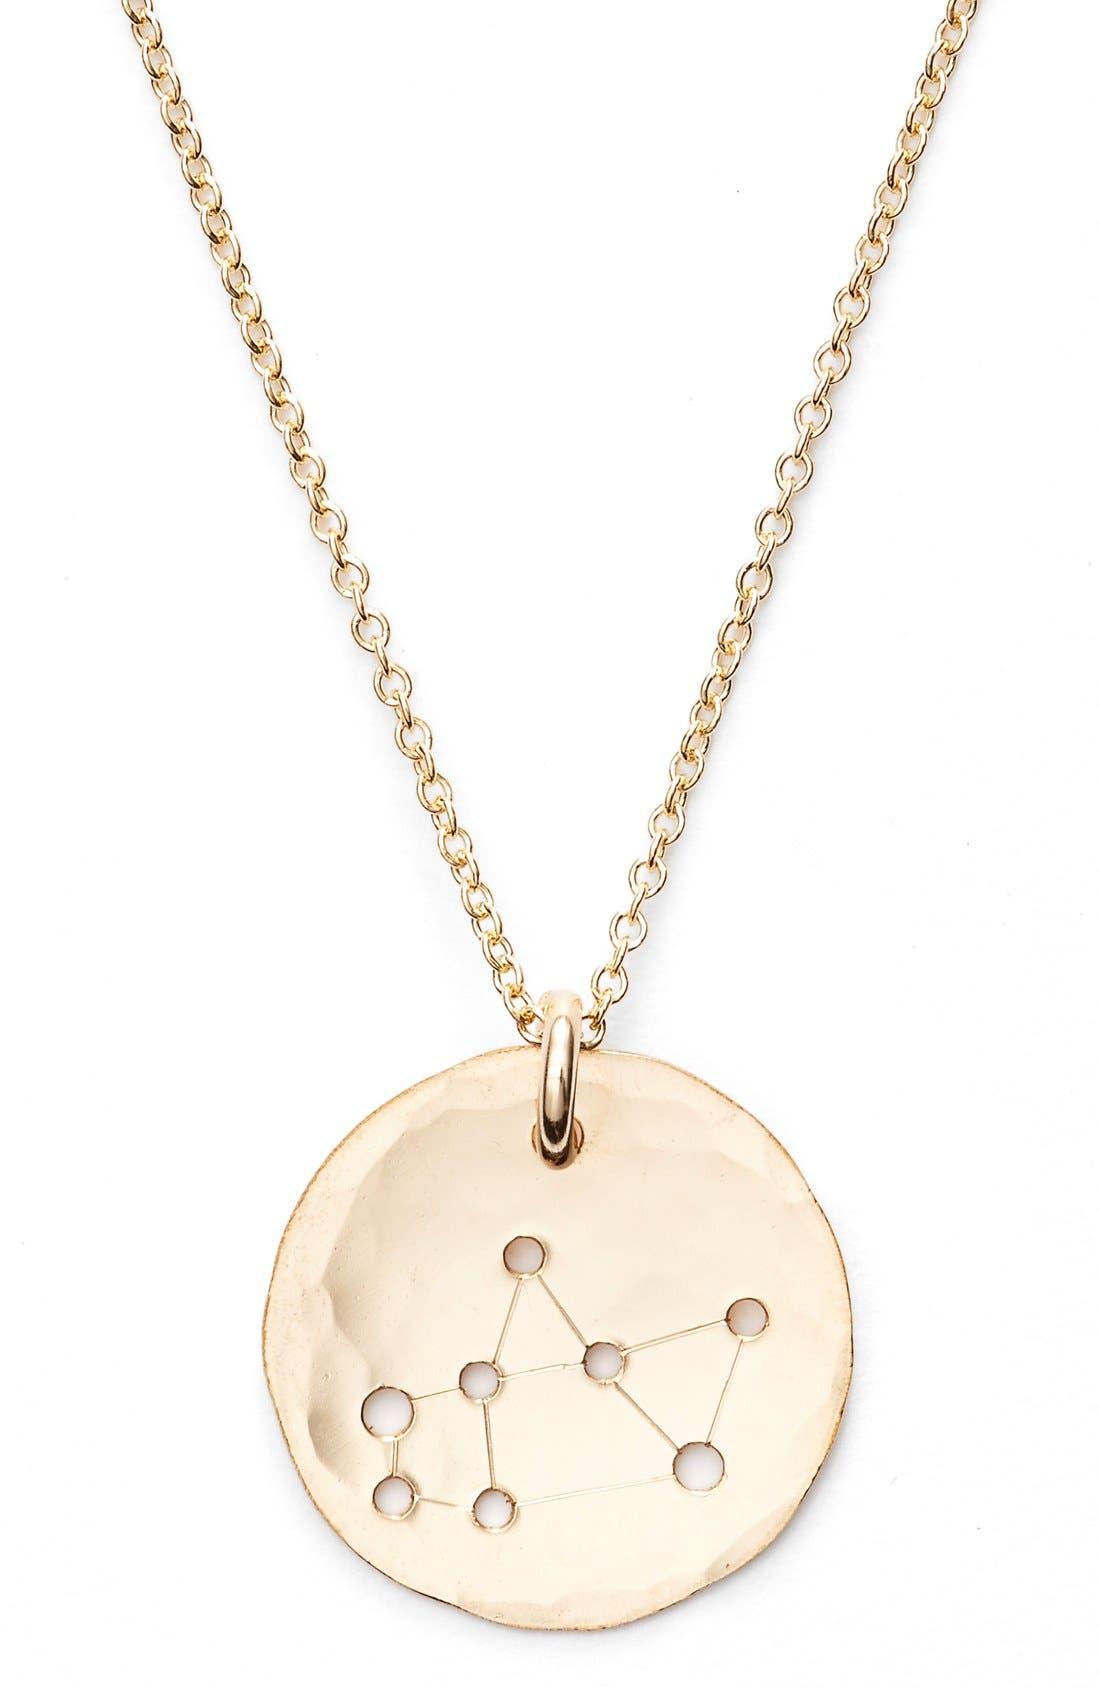 Ija 'Small Zodiac' 14k-Gold Fill Necklace,                             Alternate thumbnail 33, color,